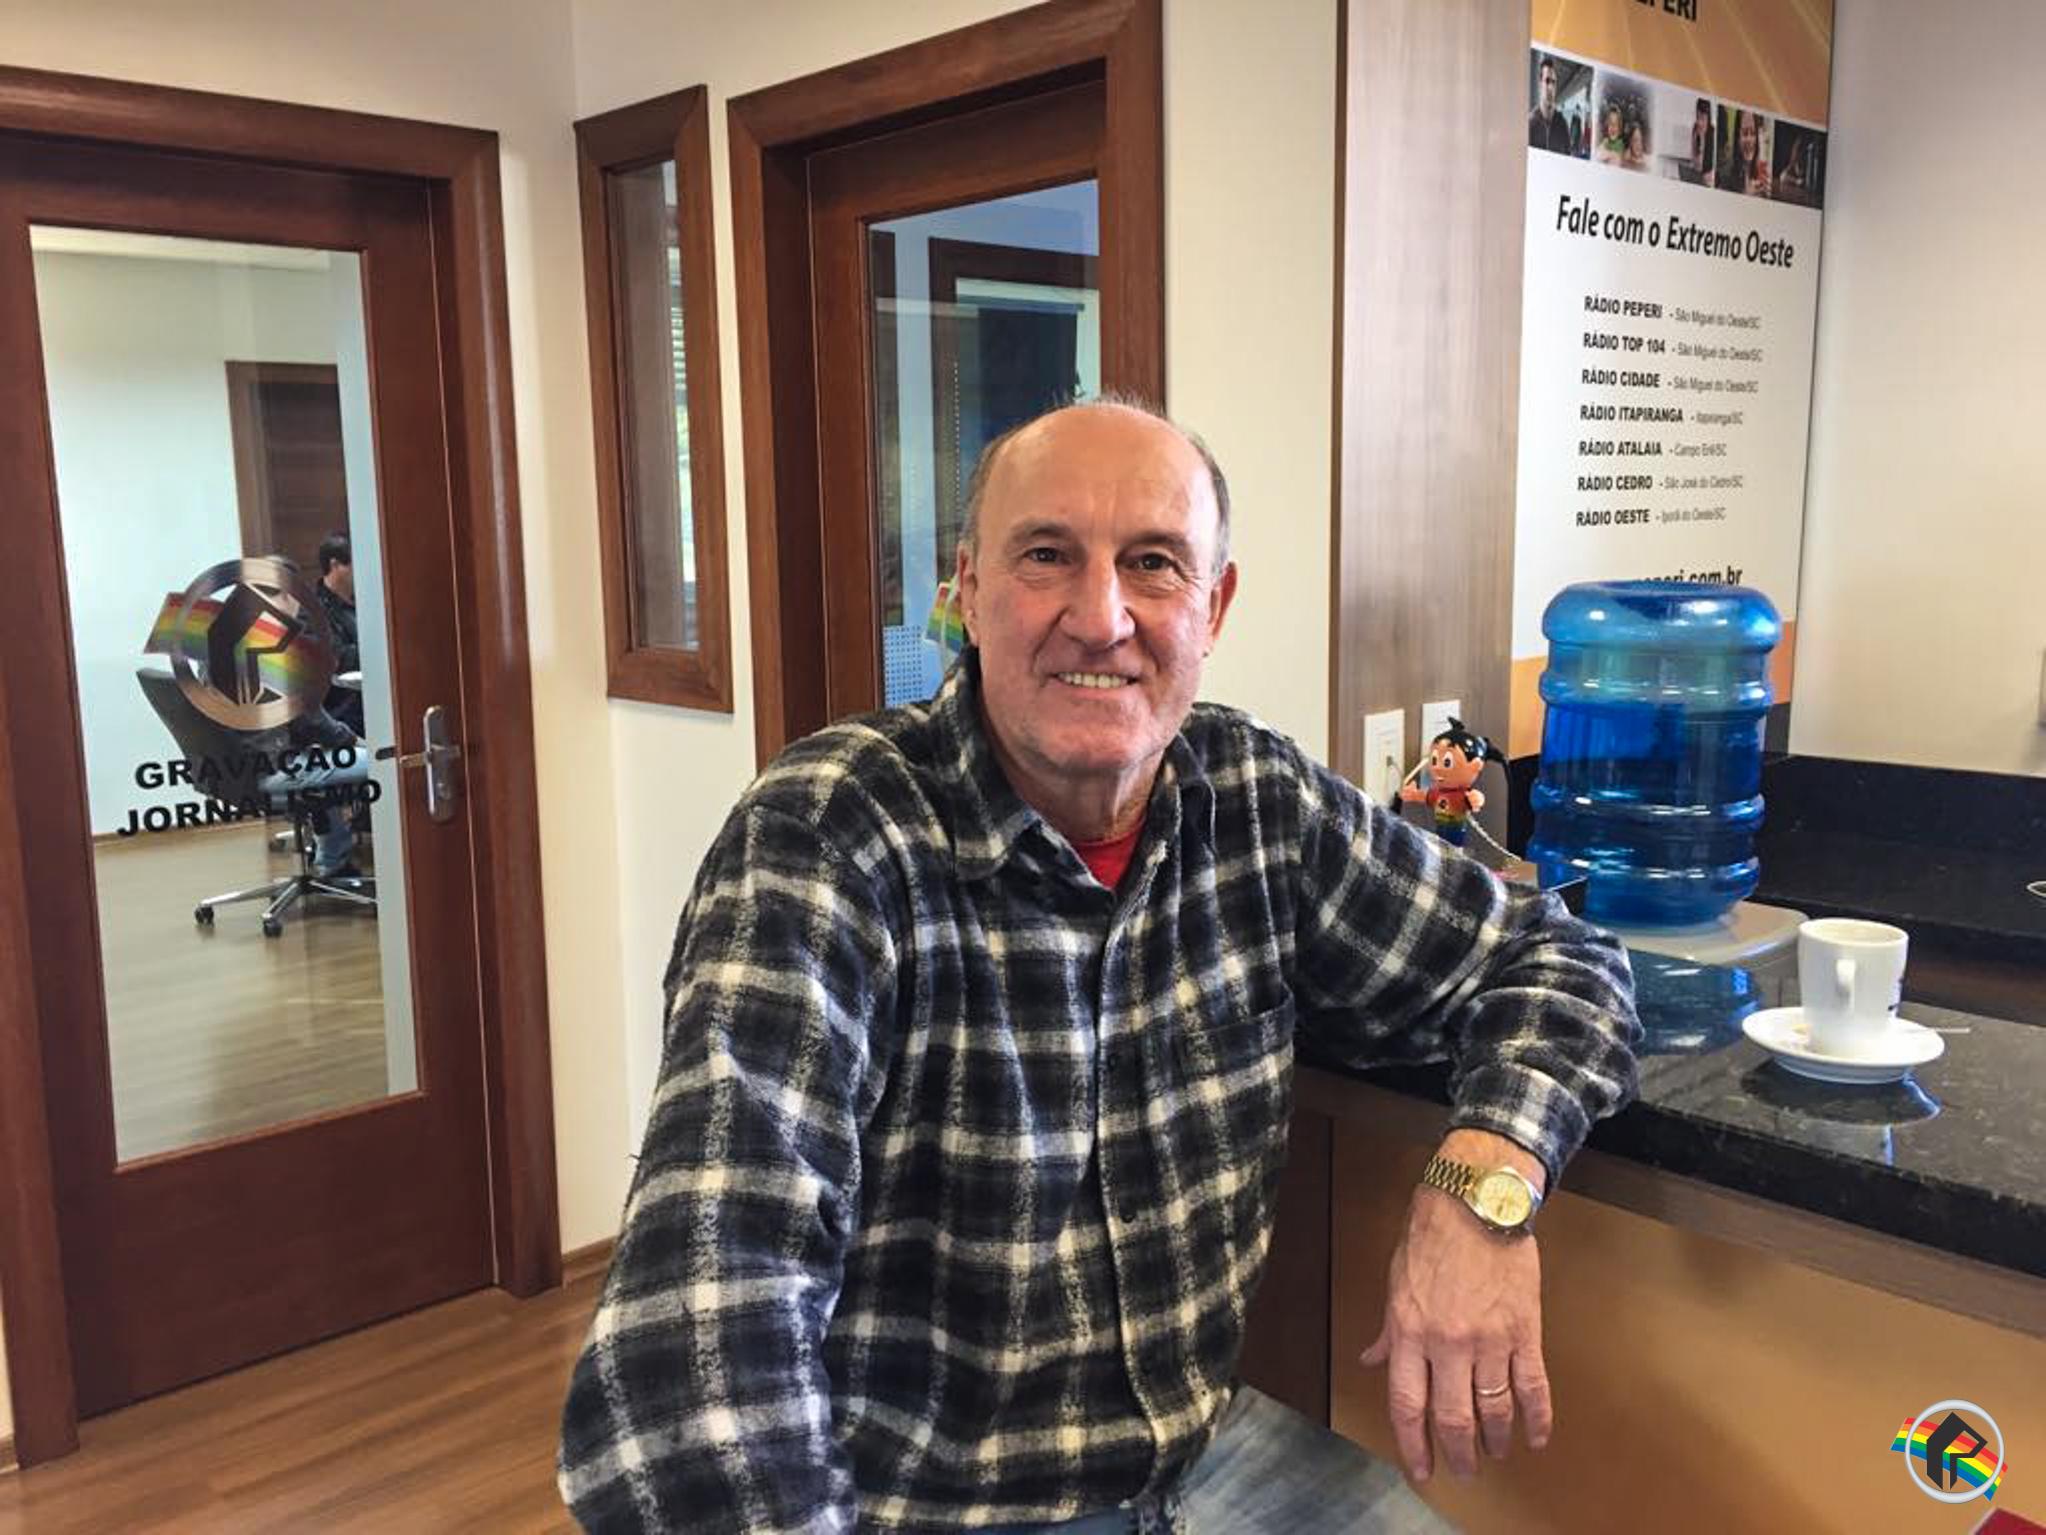 Peperi fala dos 36 anos do Super Centenaro no município